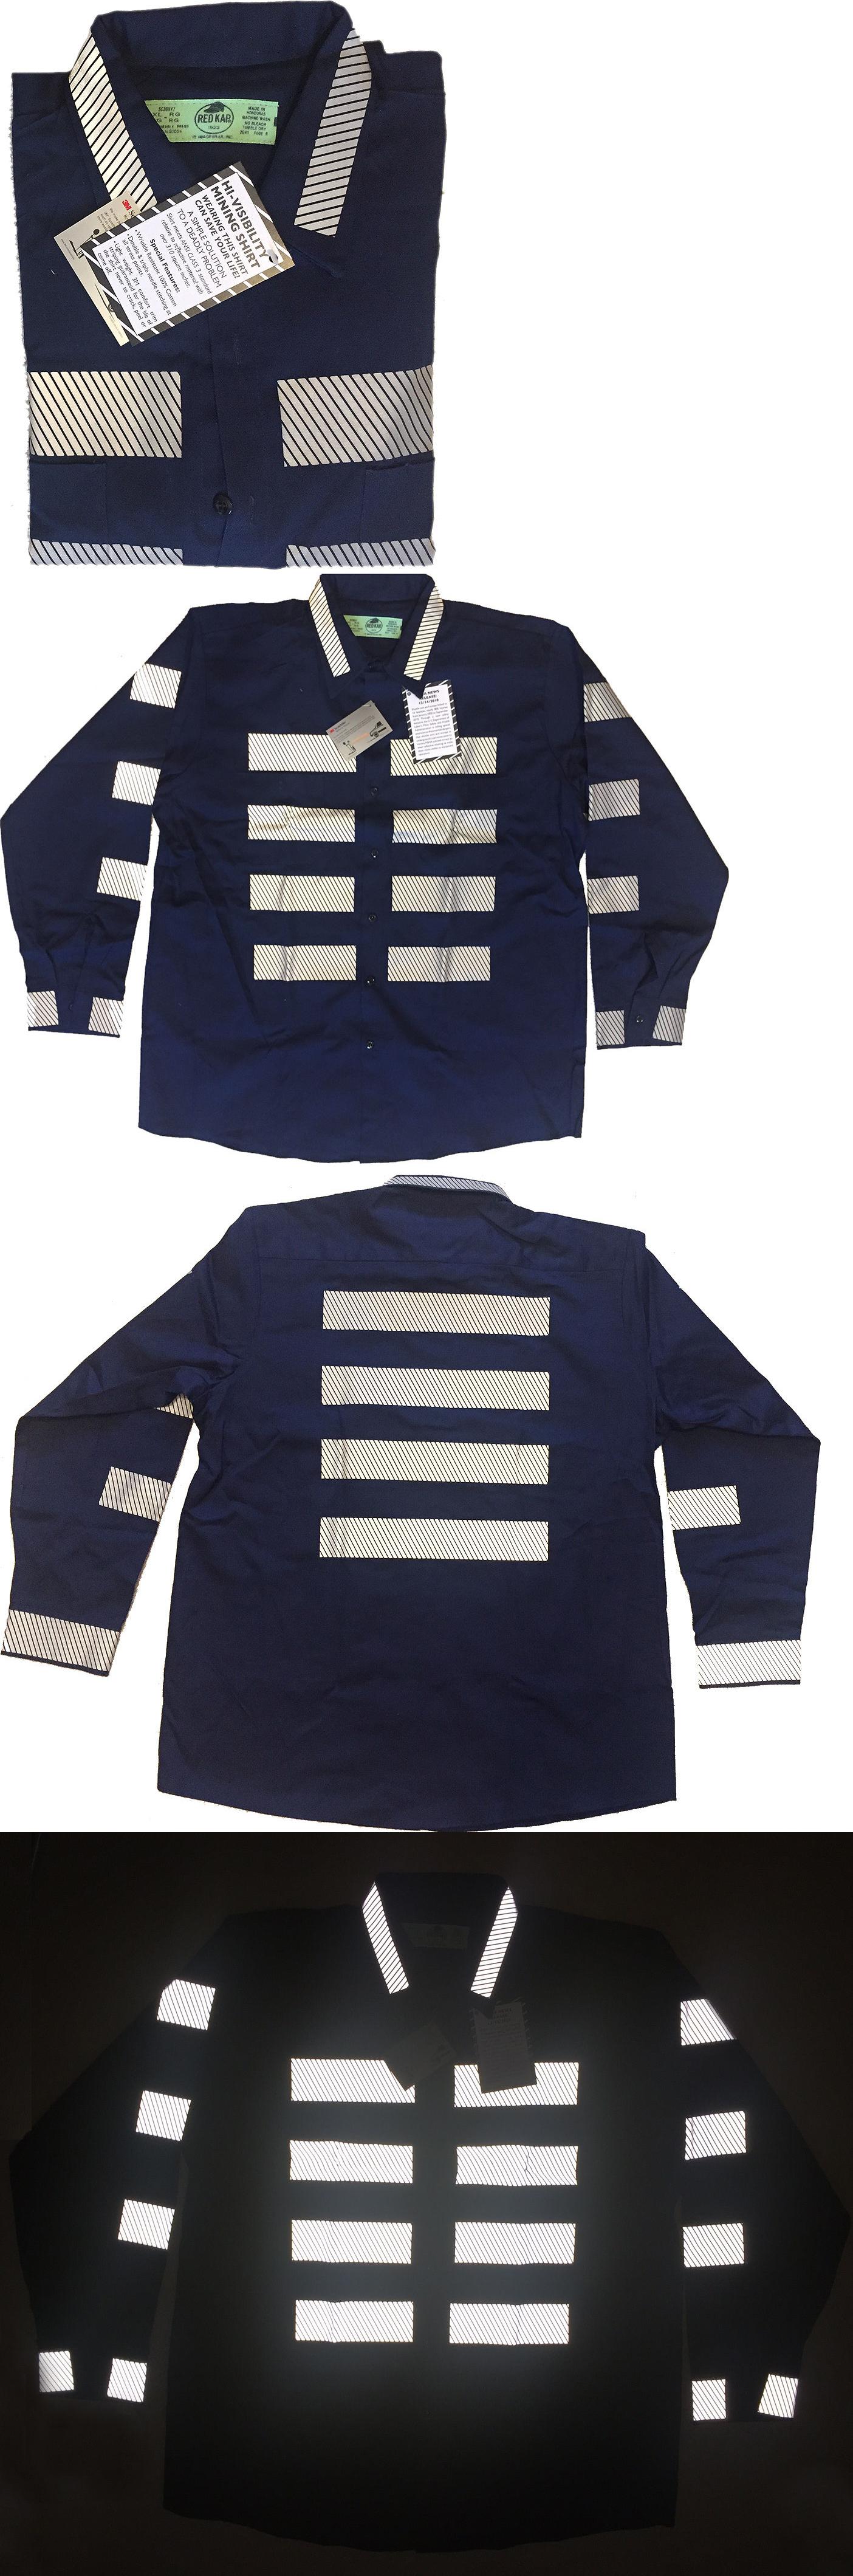 Mechanic Shirts Custom Name Patch Summer Cook